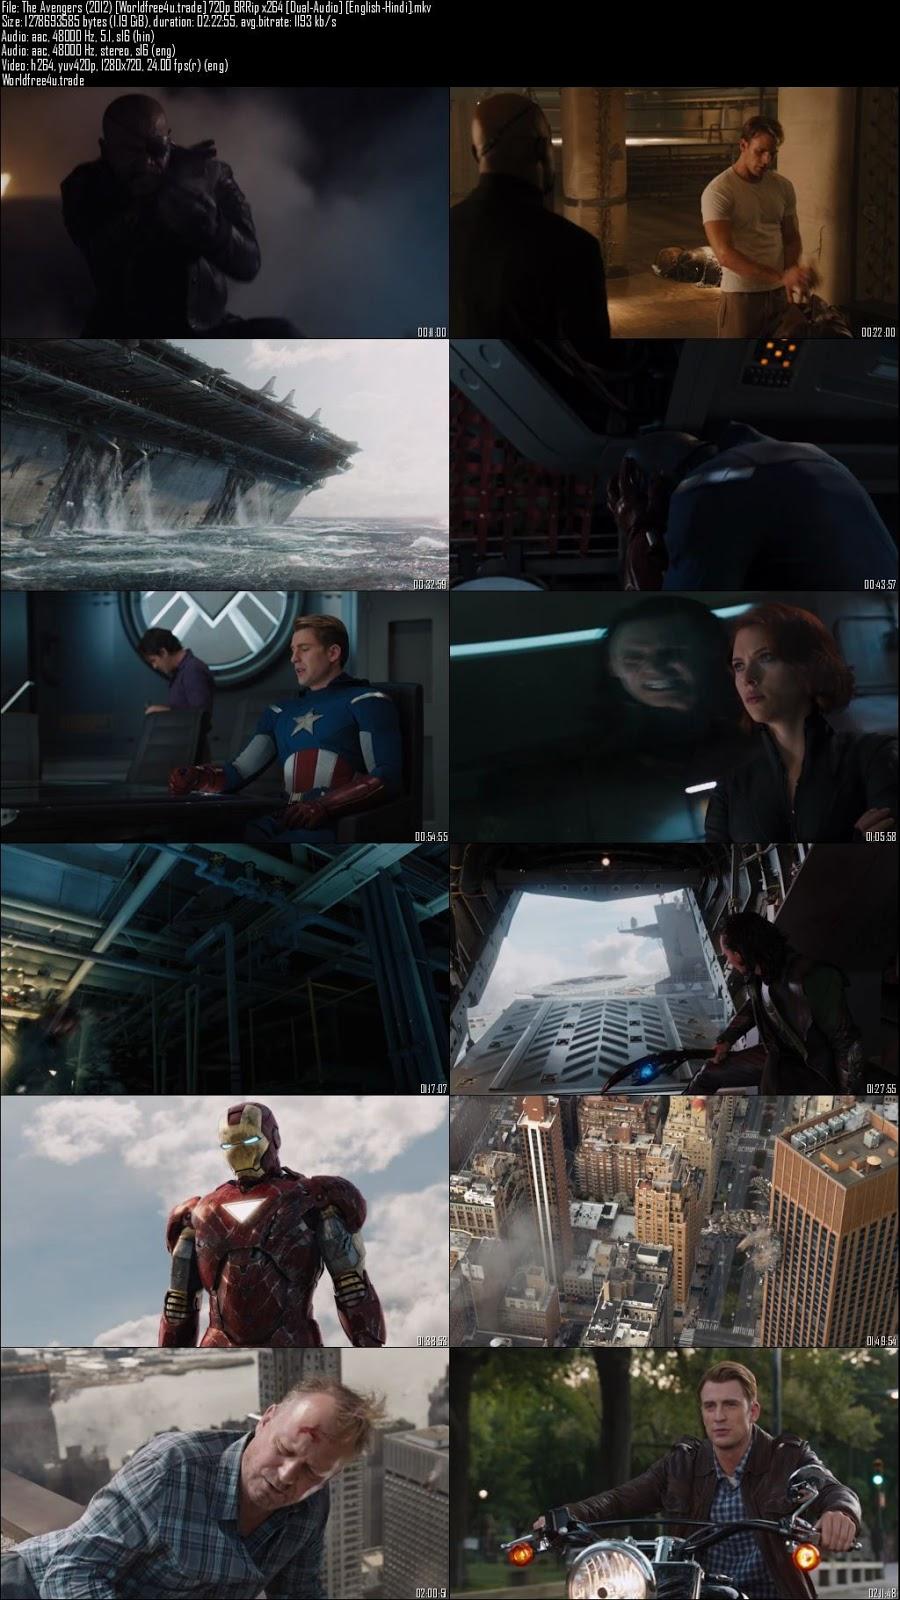 ScreenShot of The Avengers (2012) BRRip 720p Dual Audio In Hindi English